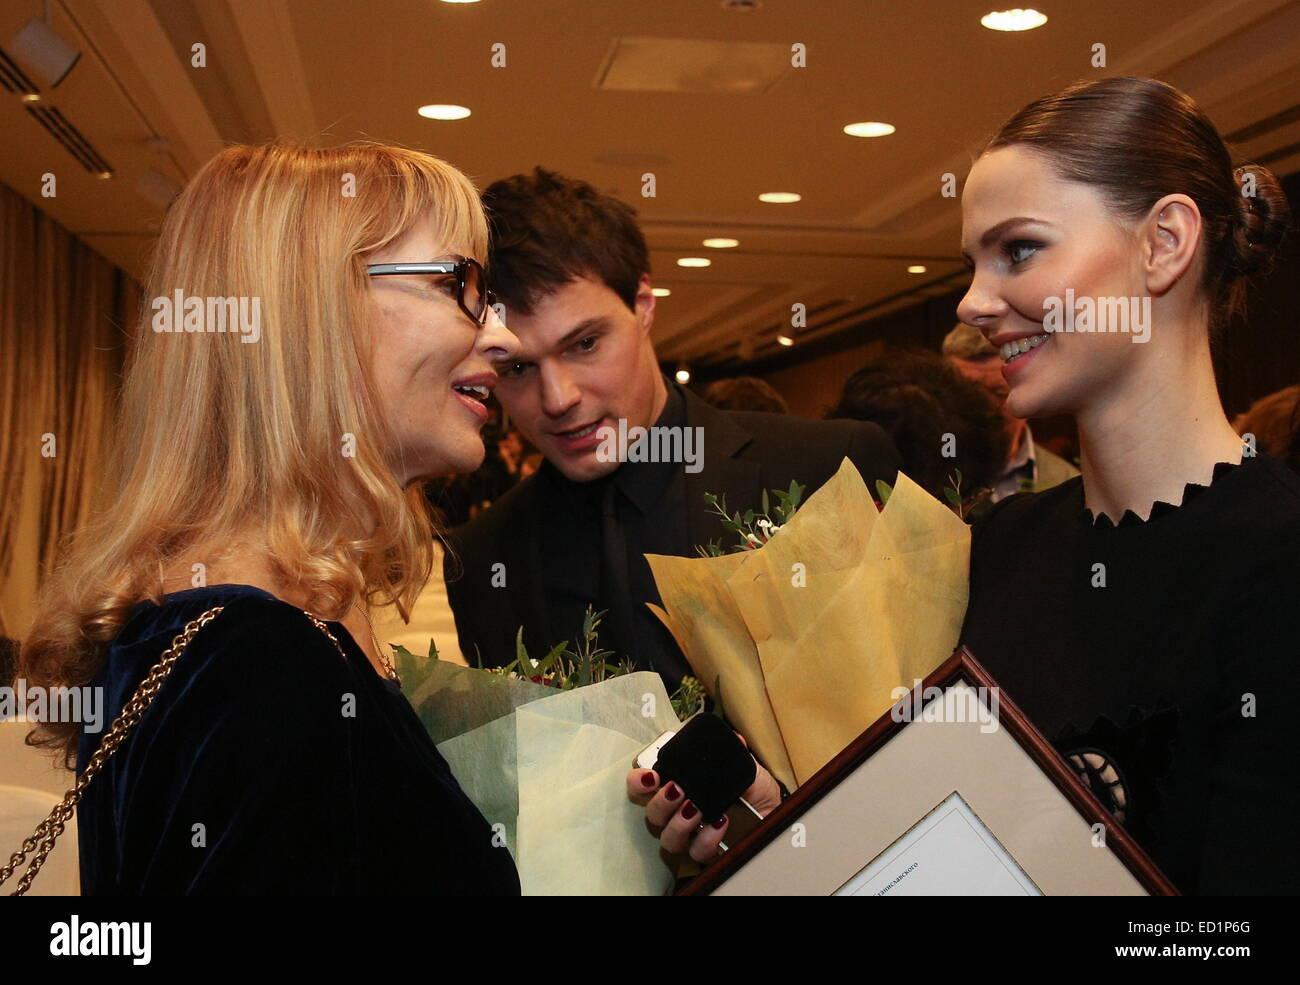 Elizaveta Boyarskaya shared the details of her personal life